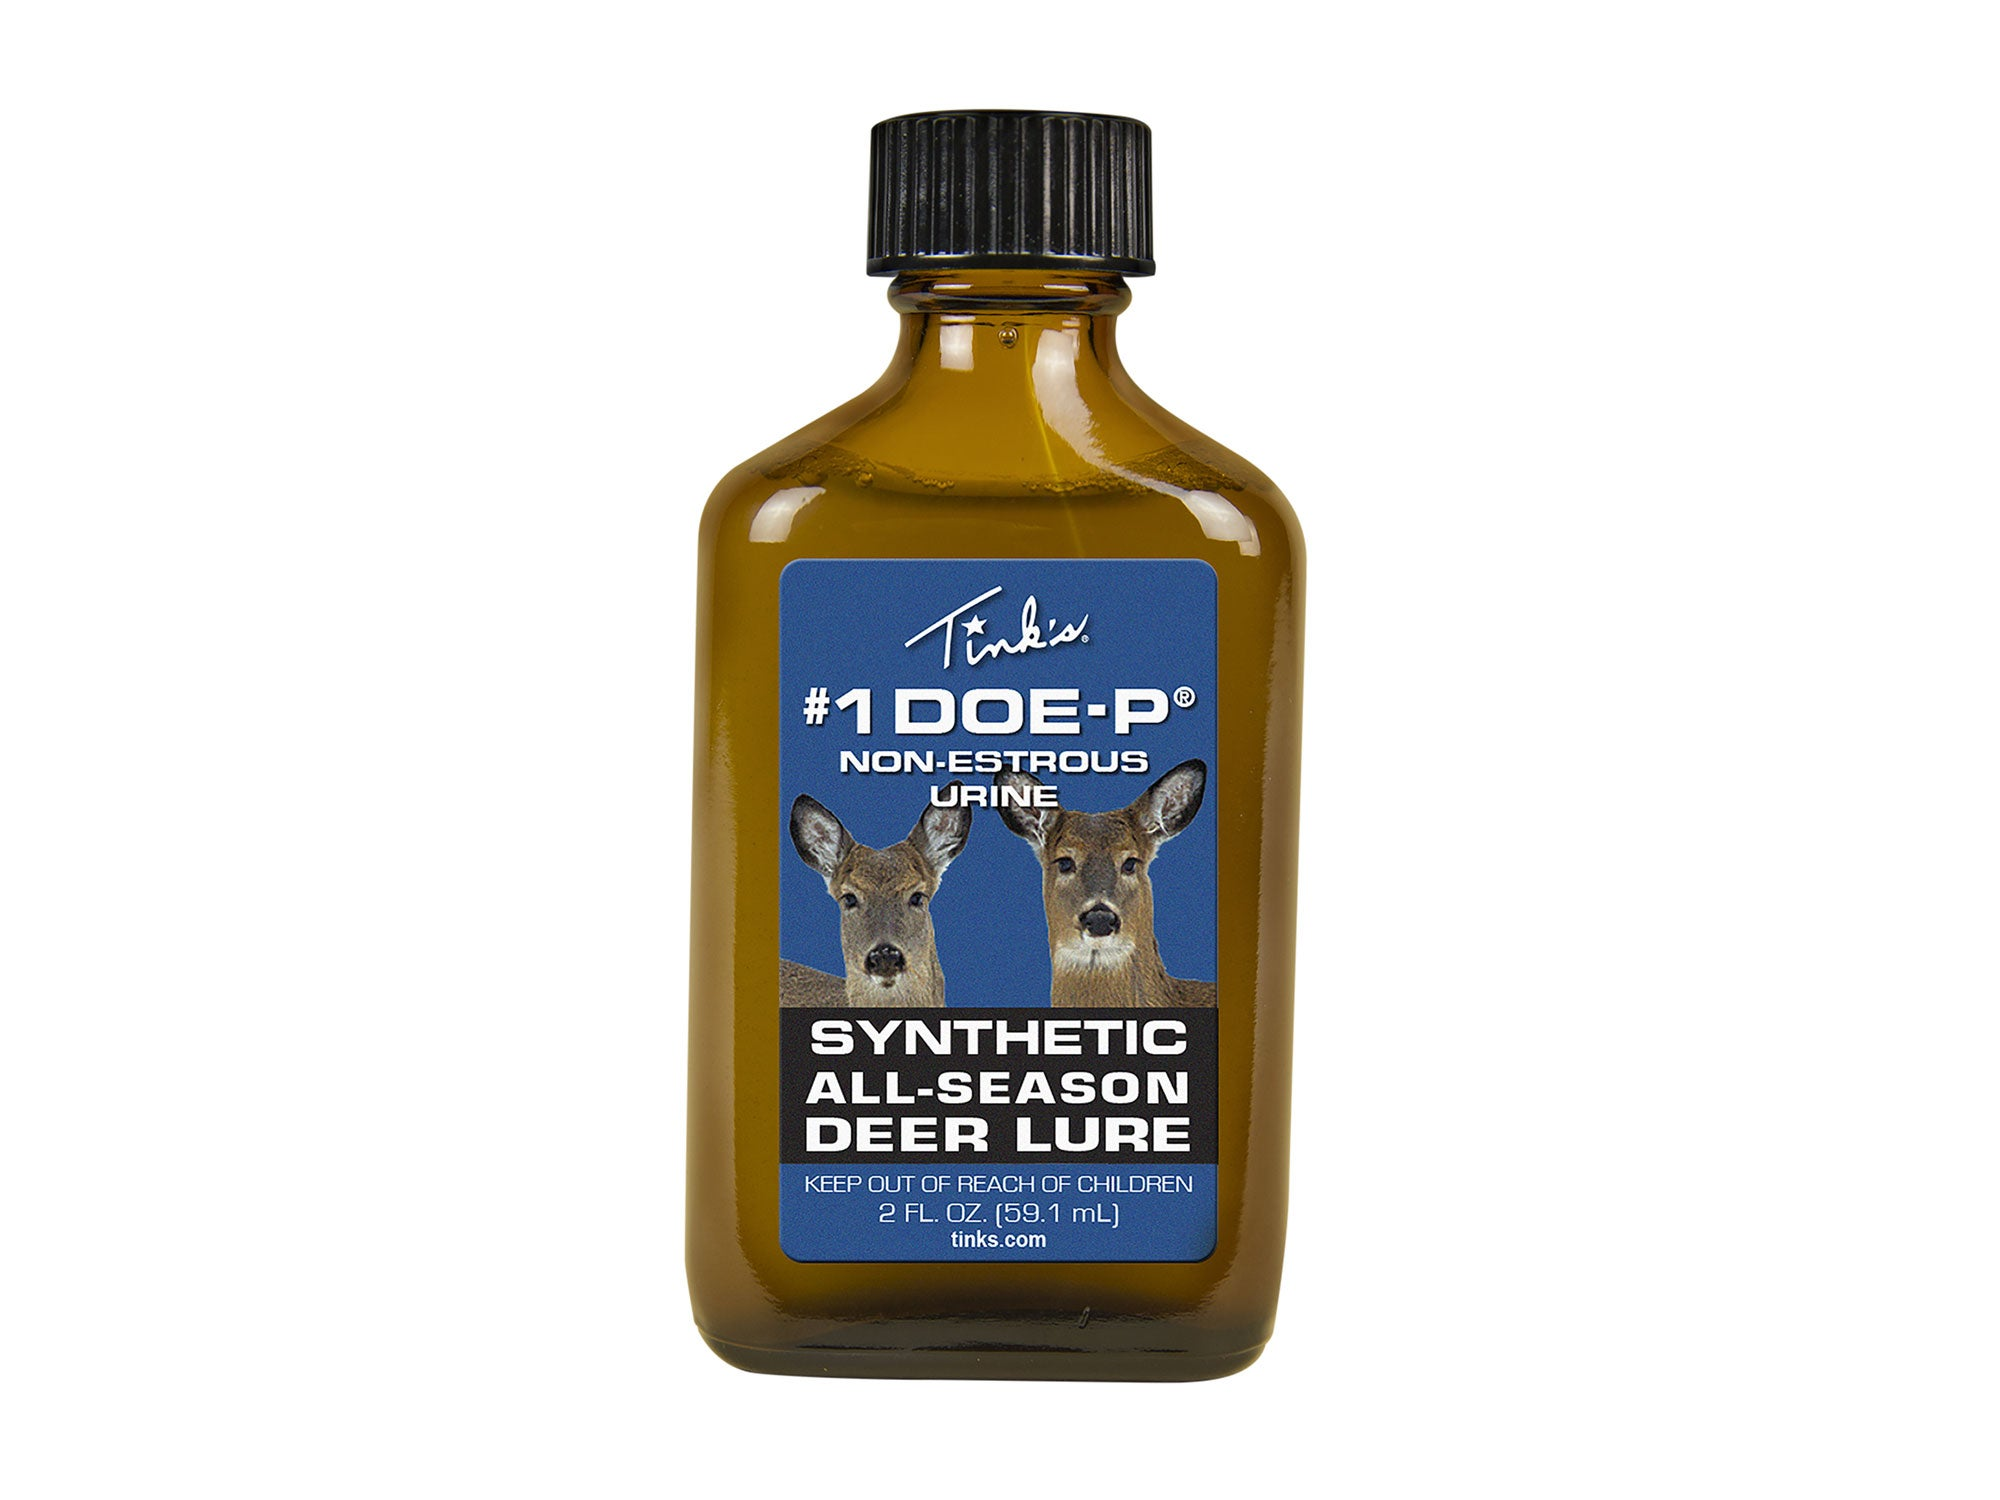 Synthetic doe urine